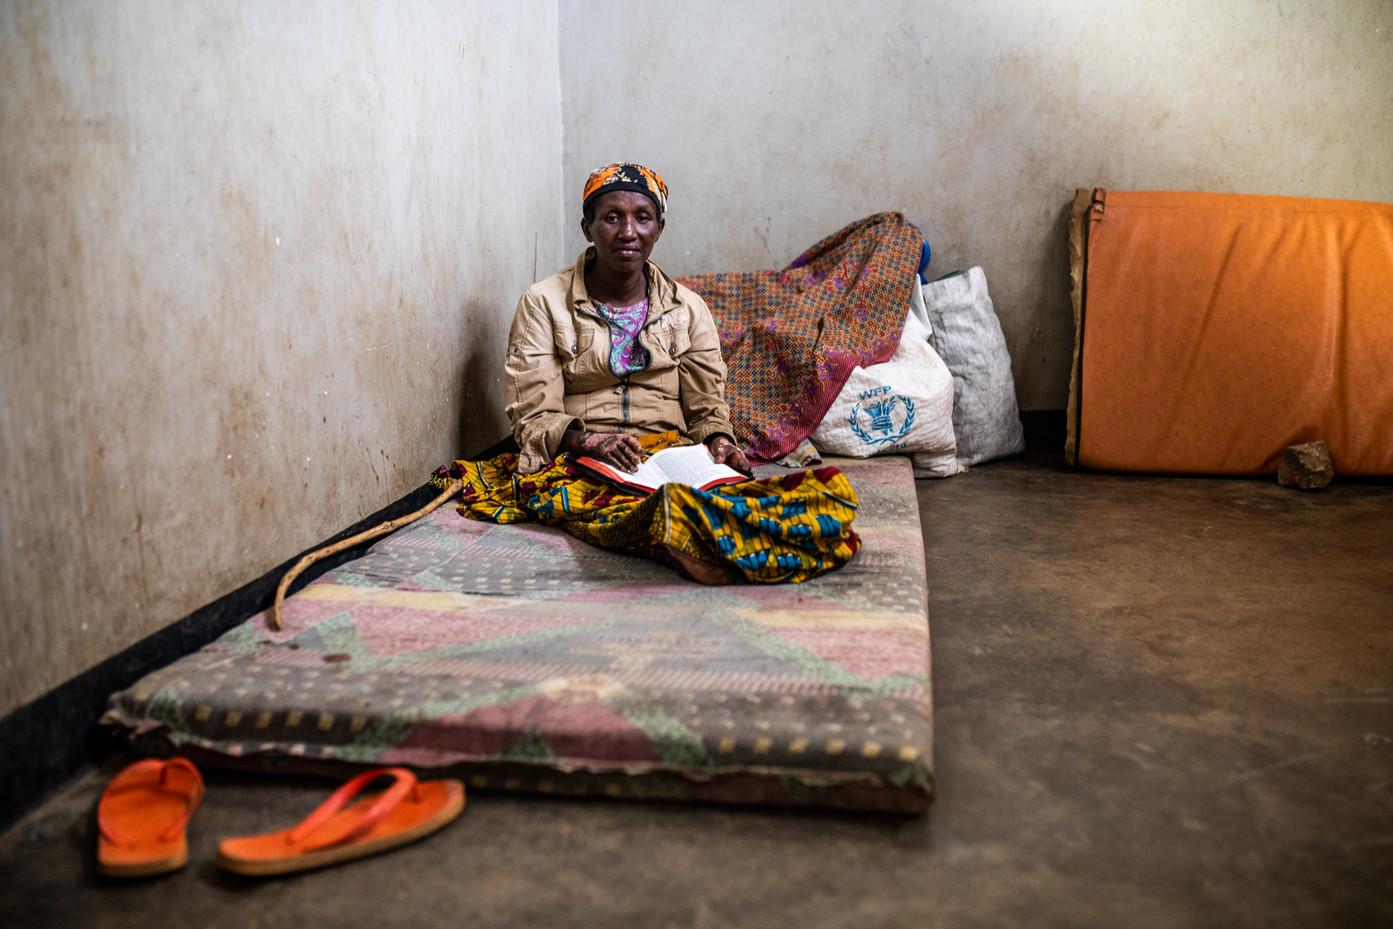 Khadja Irakoze from Burundi reads bible and gets comfort out of it.